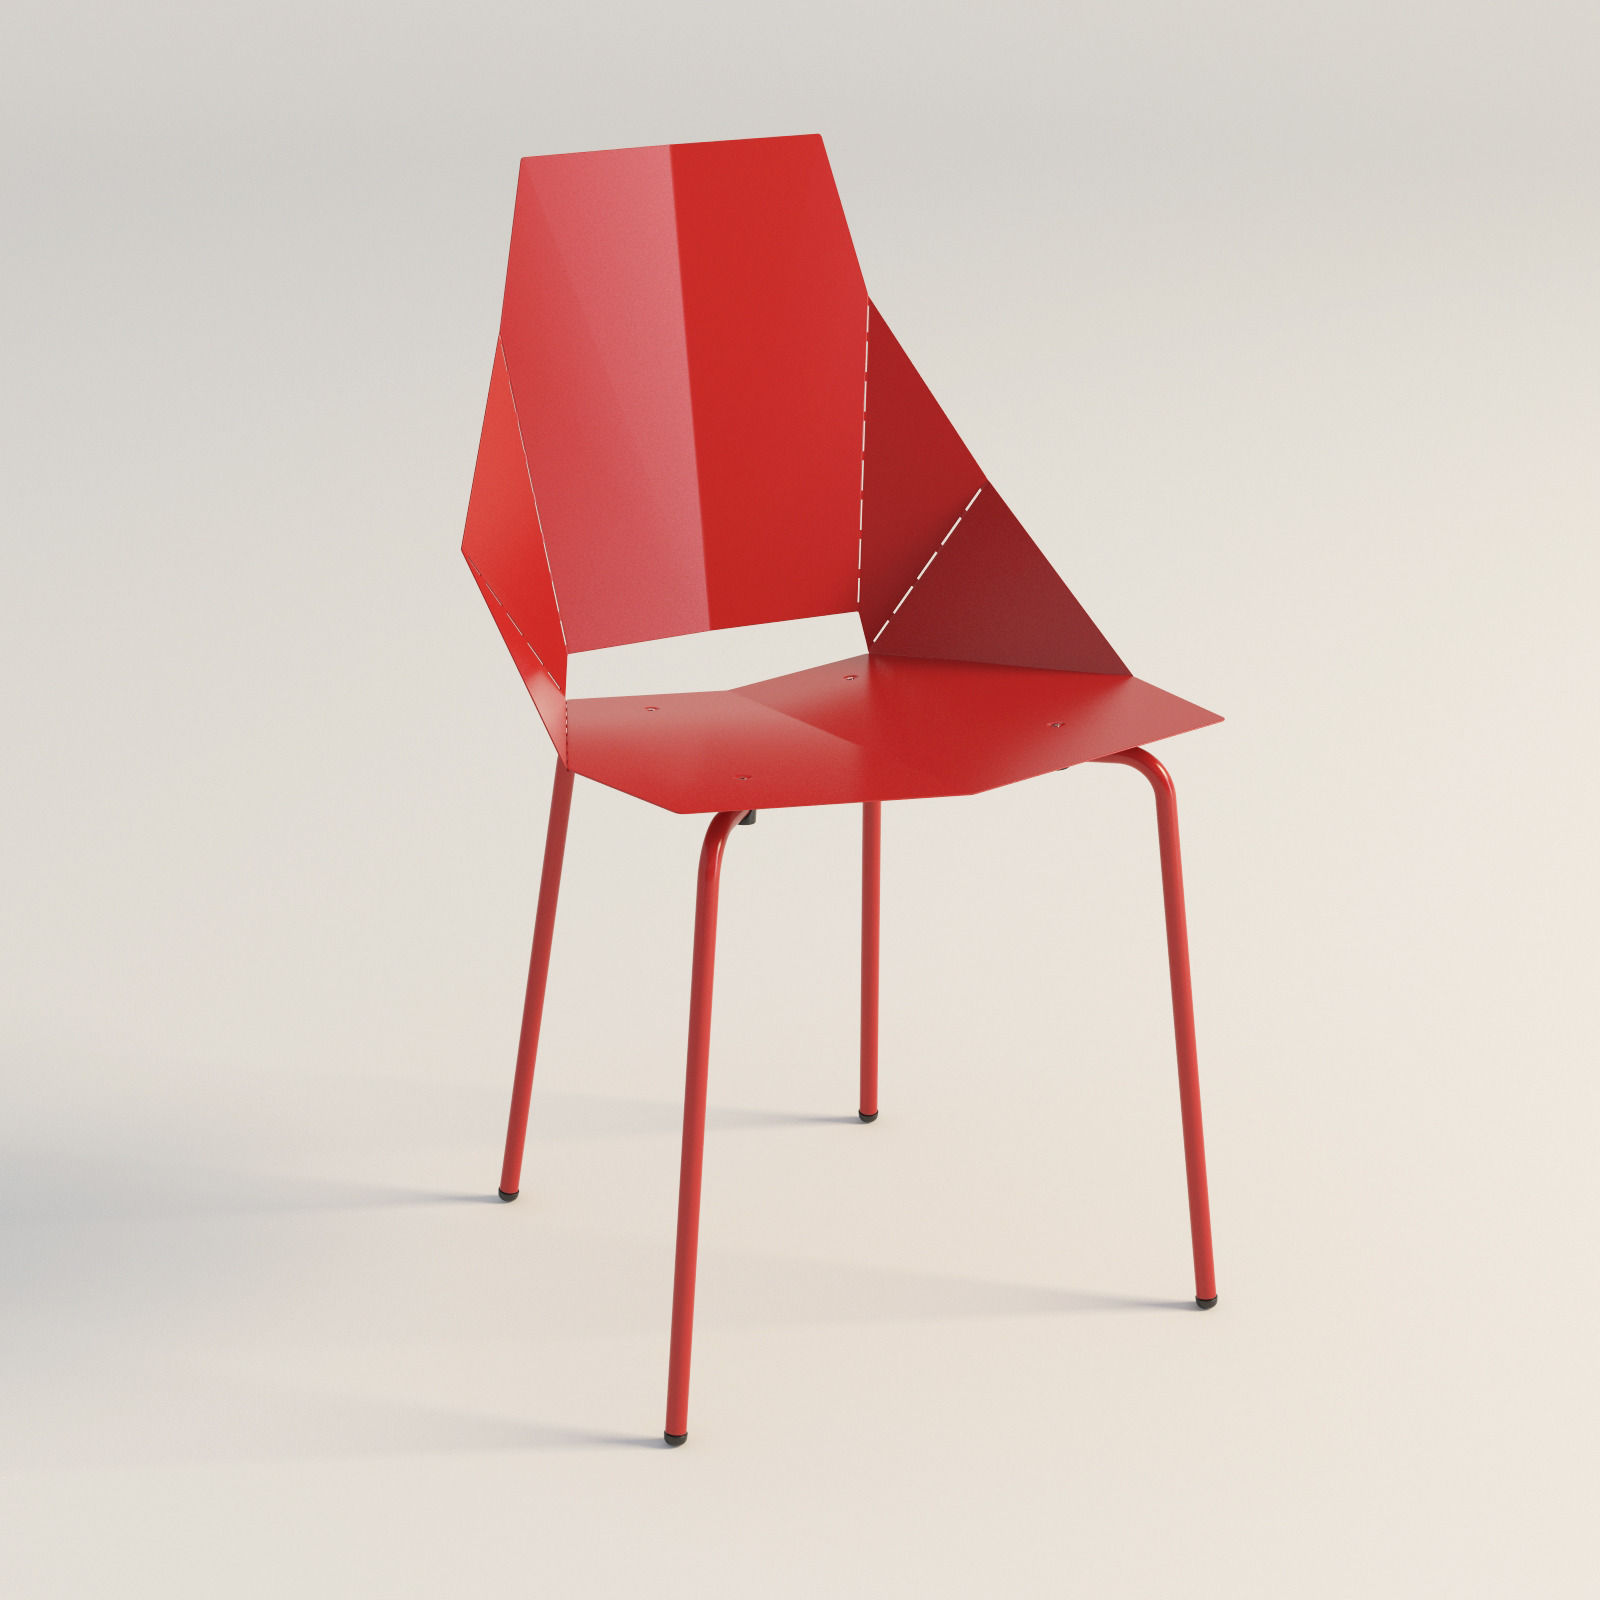 real good chair mid century barrel dining blu dot 3d model max obj 3ds fbx mtl